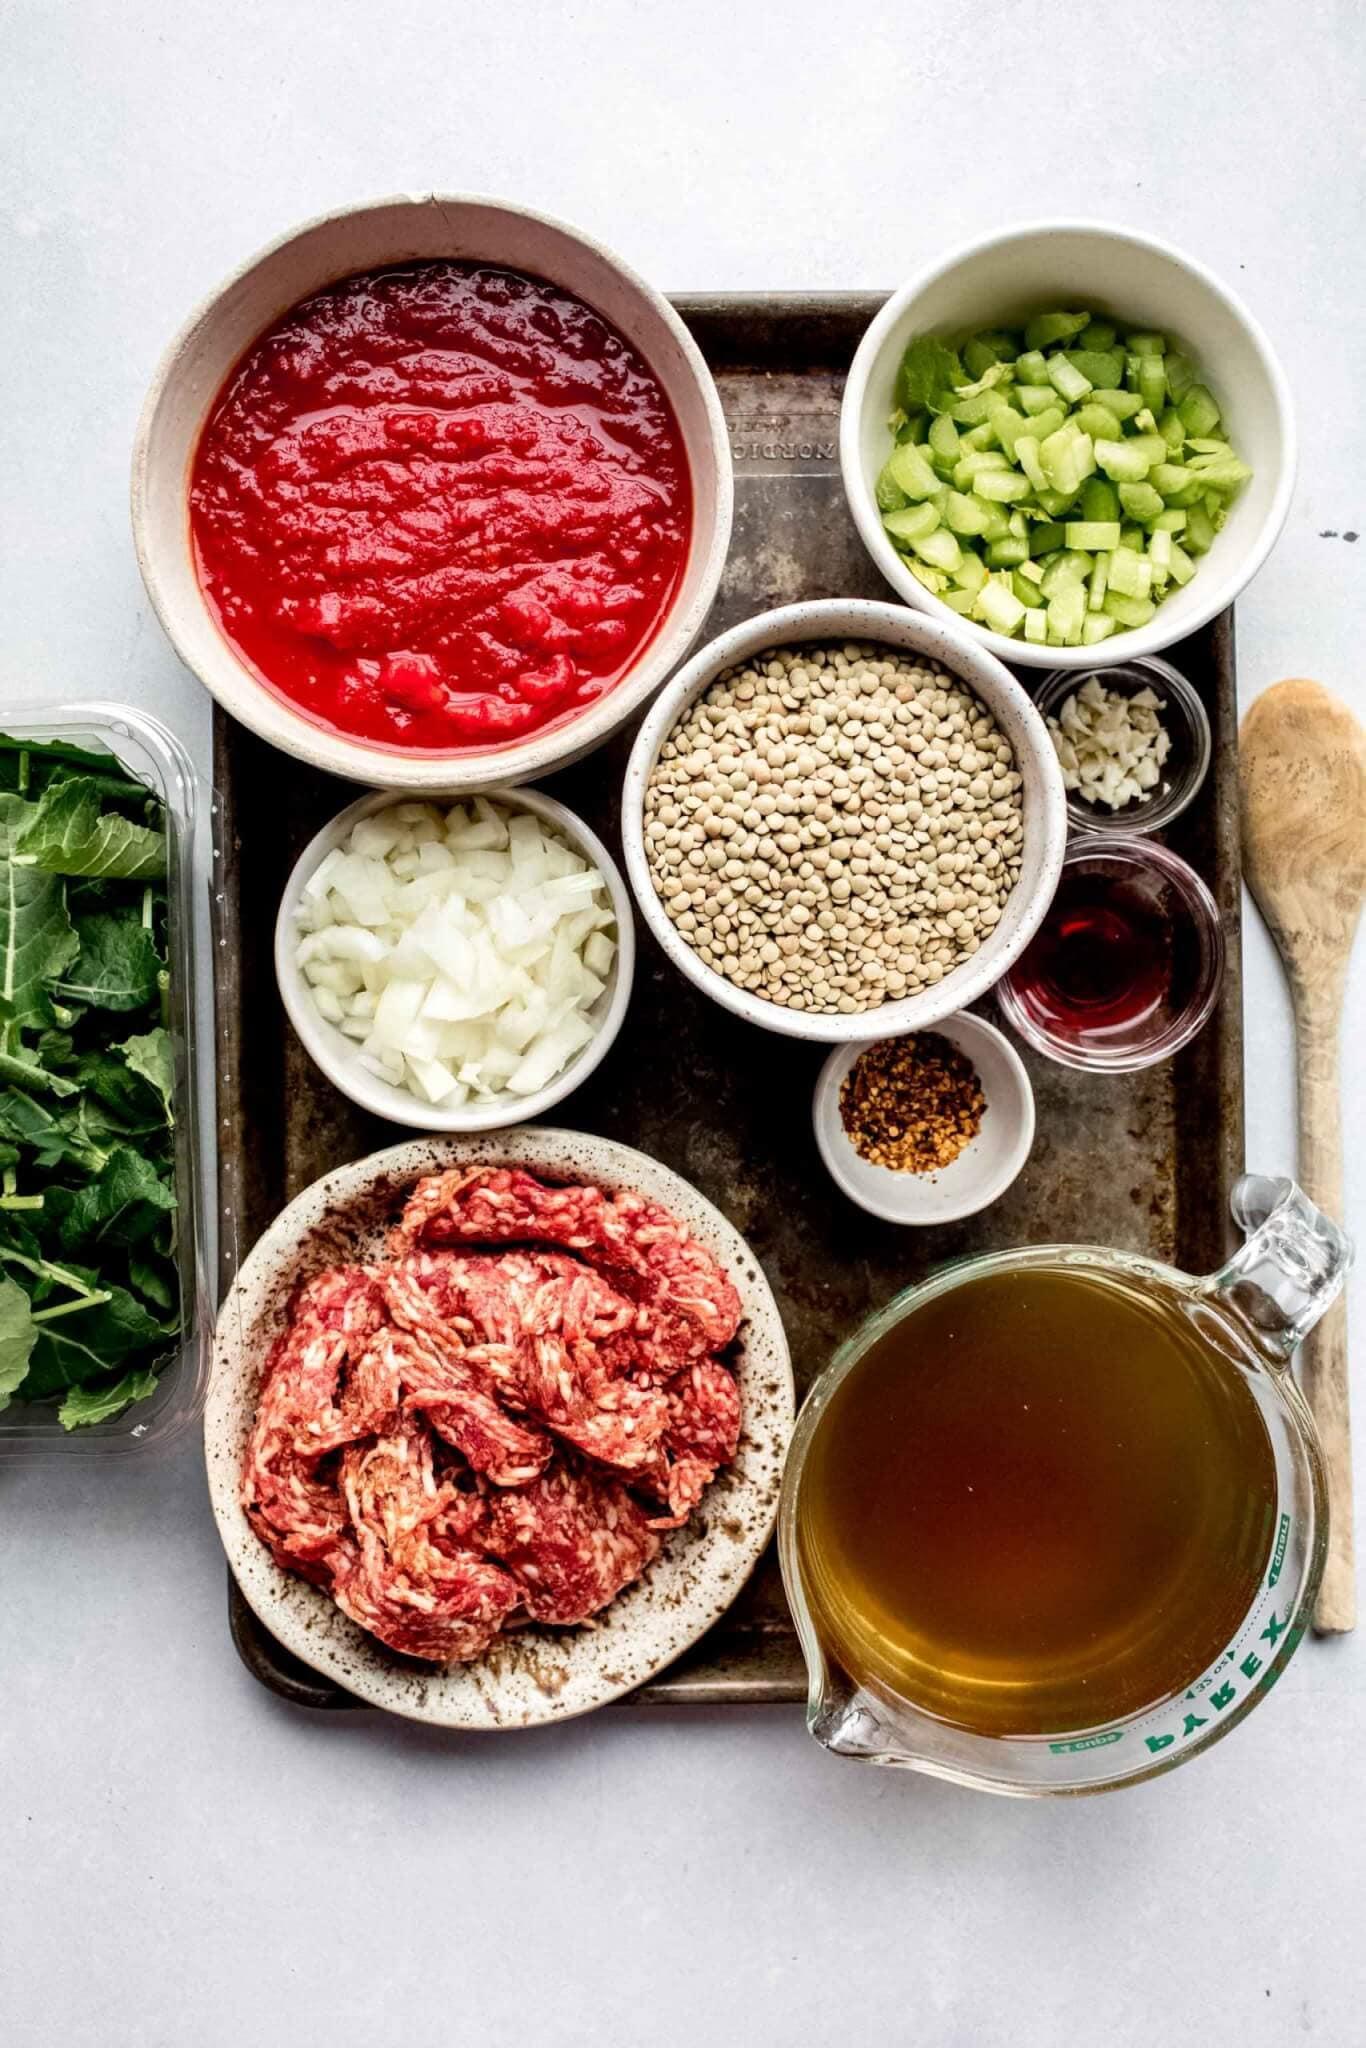 Ingredients for lentil soup on tray.